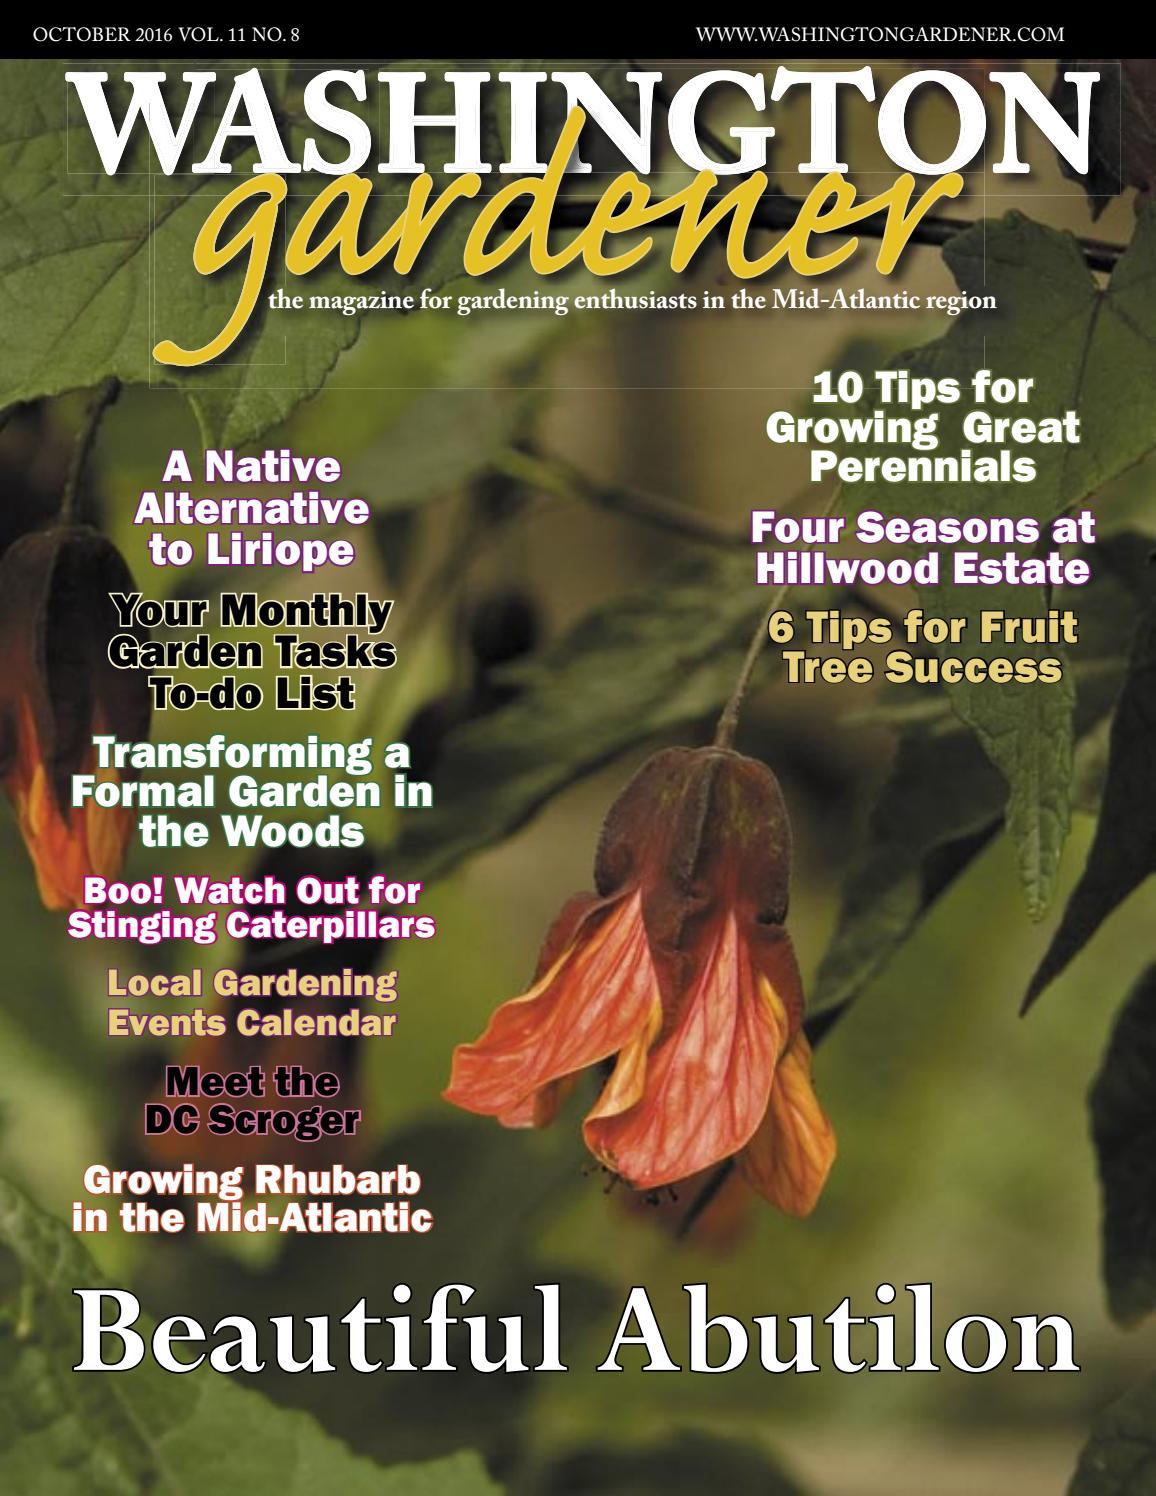 Washington Gardener October 2016 By Kathy J Issuu